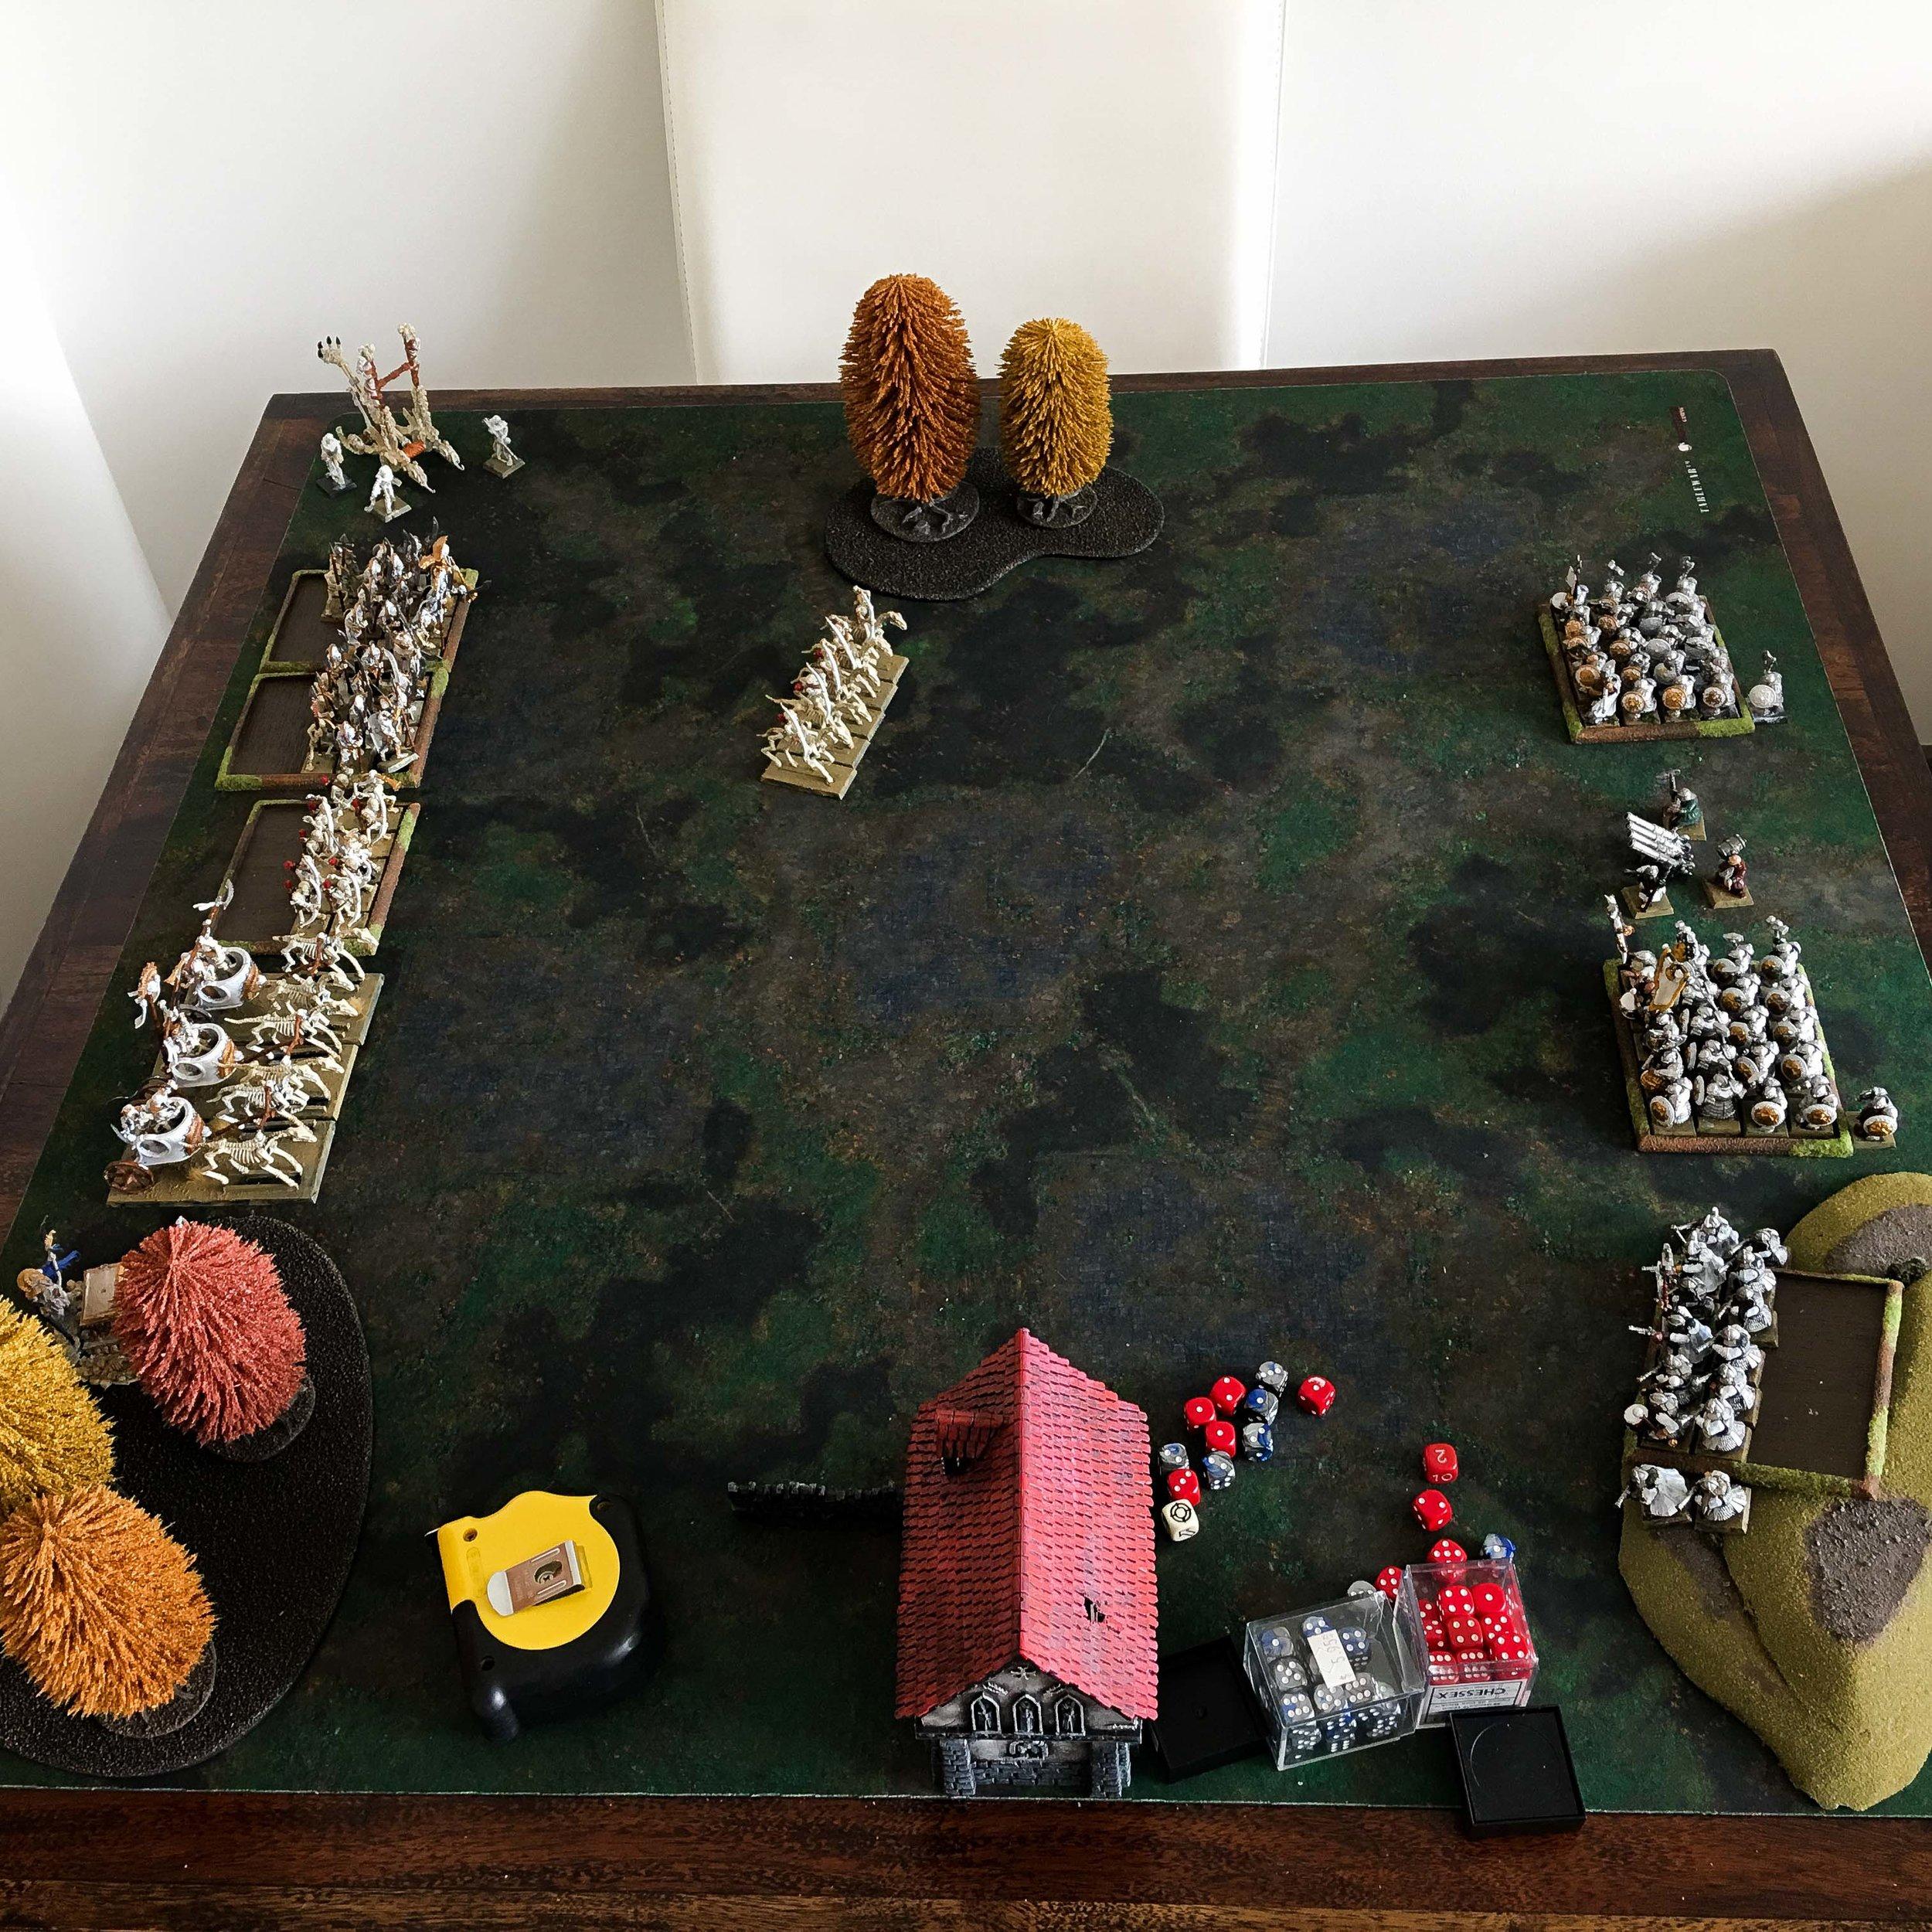 dwarf-tomb-kings-deployment